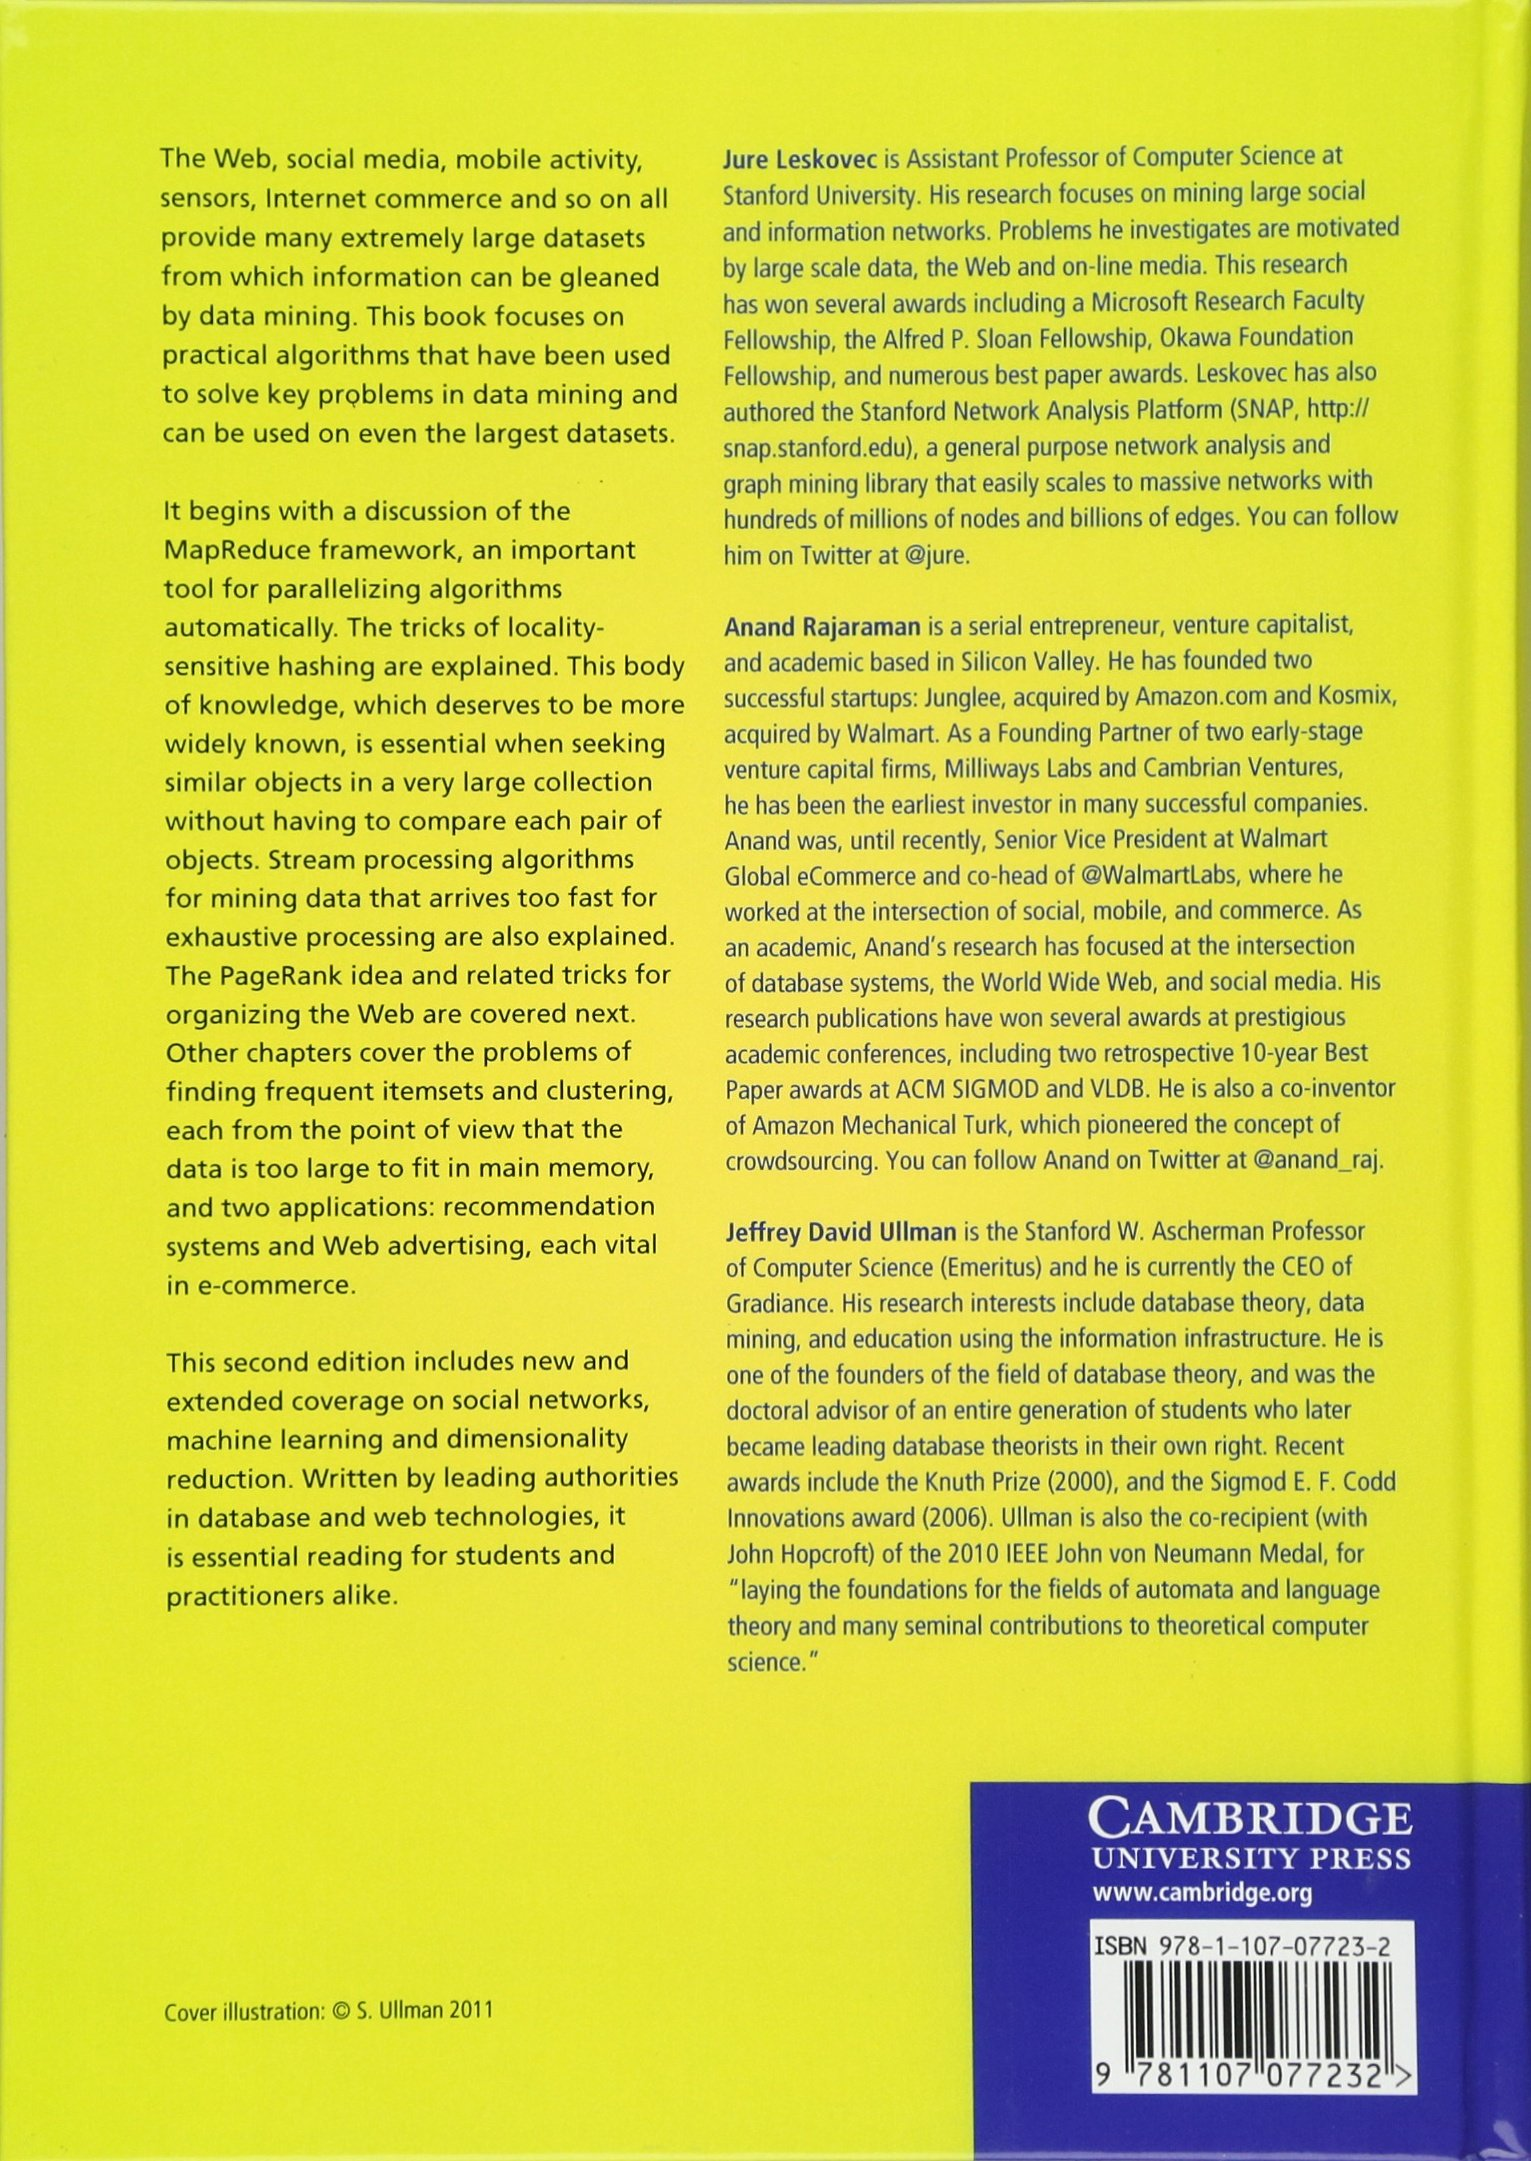 Mining of Massive Datasets: Amazon de: Jure Leskovec, Anand